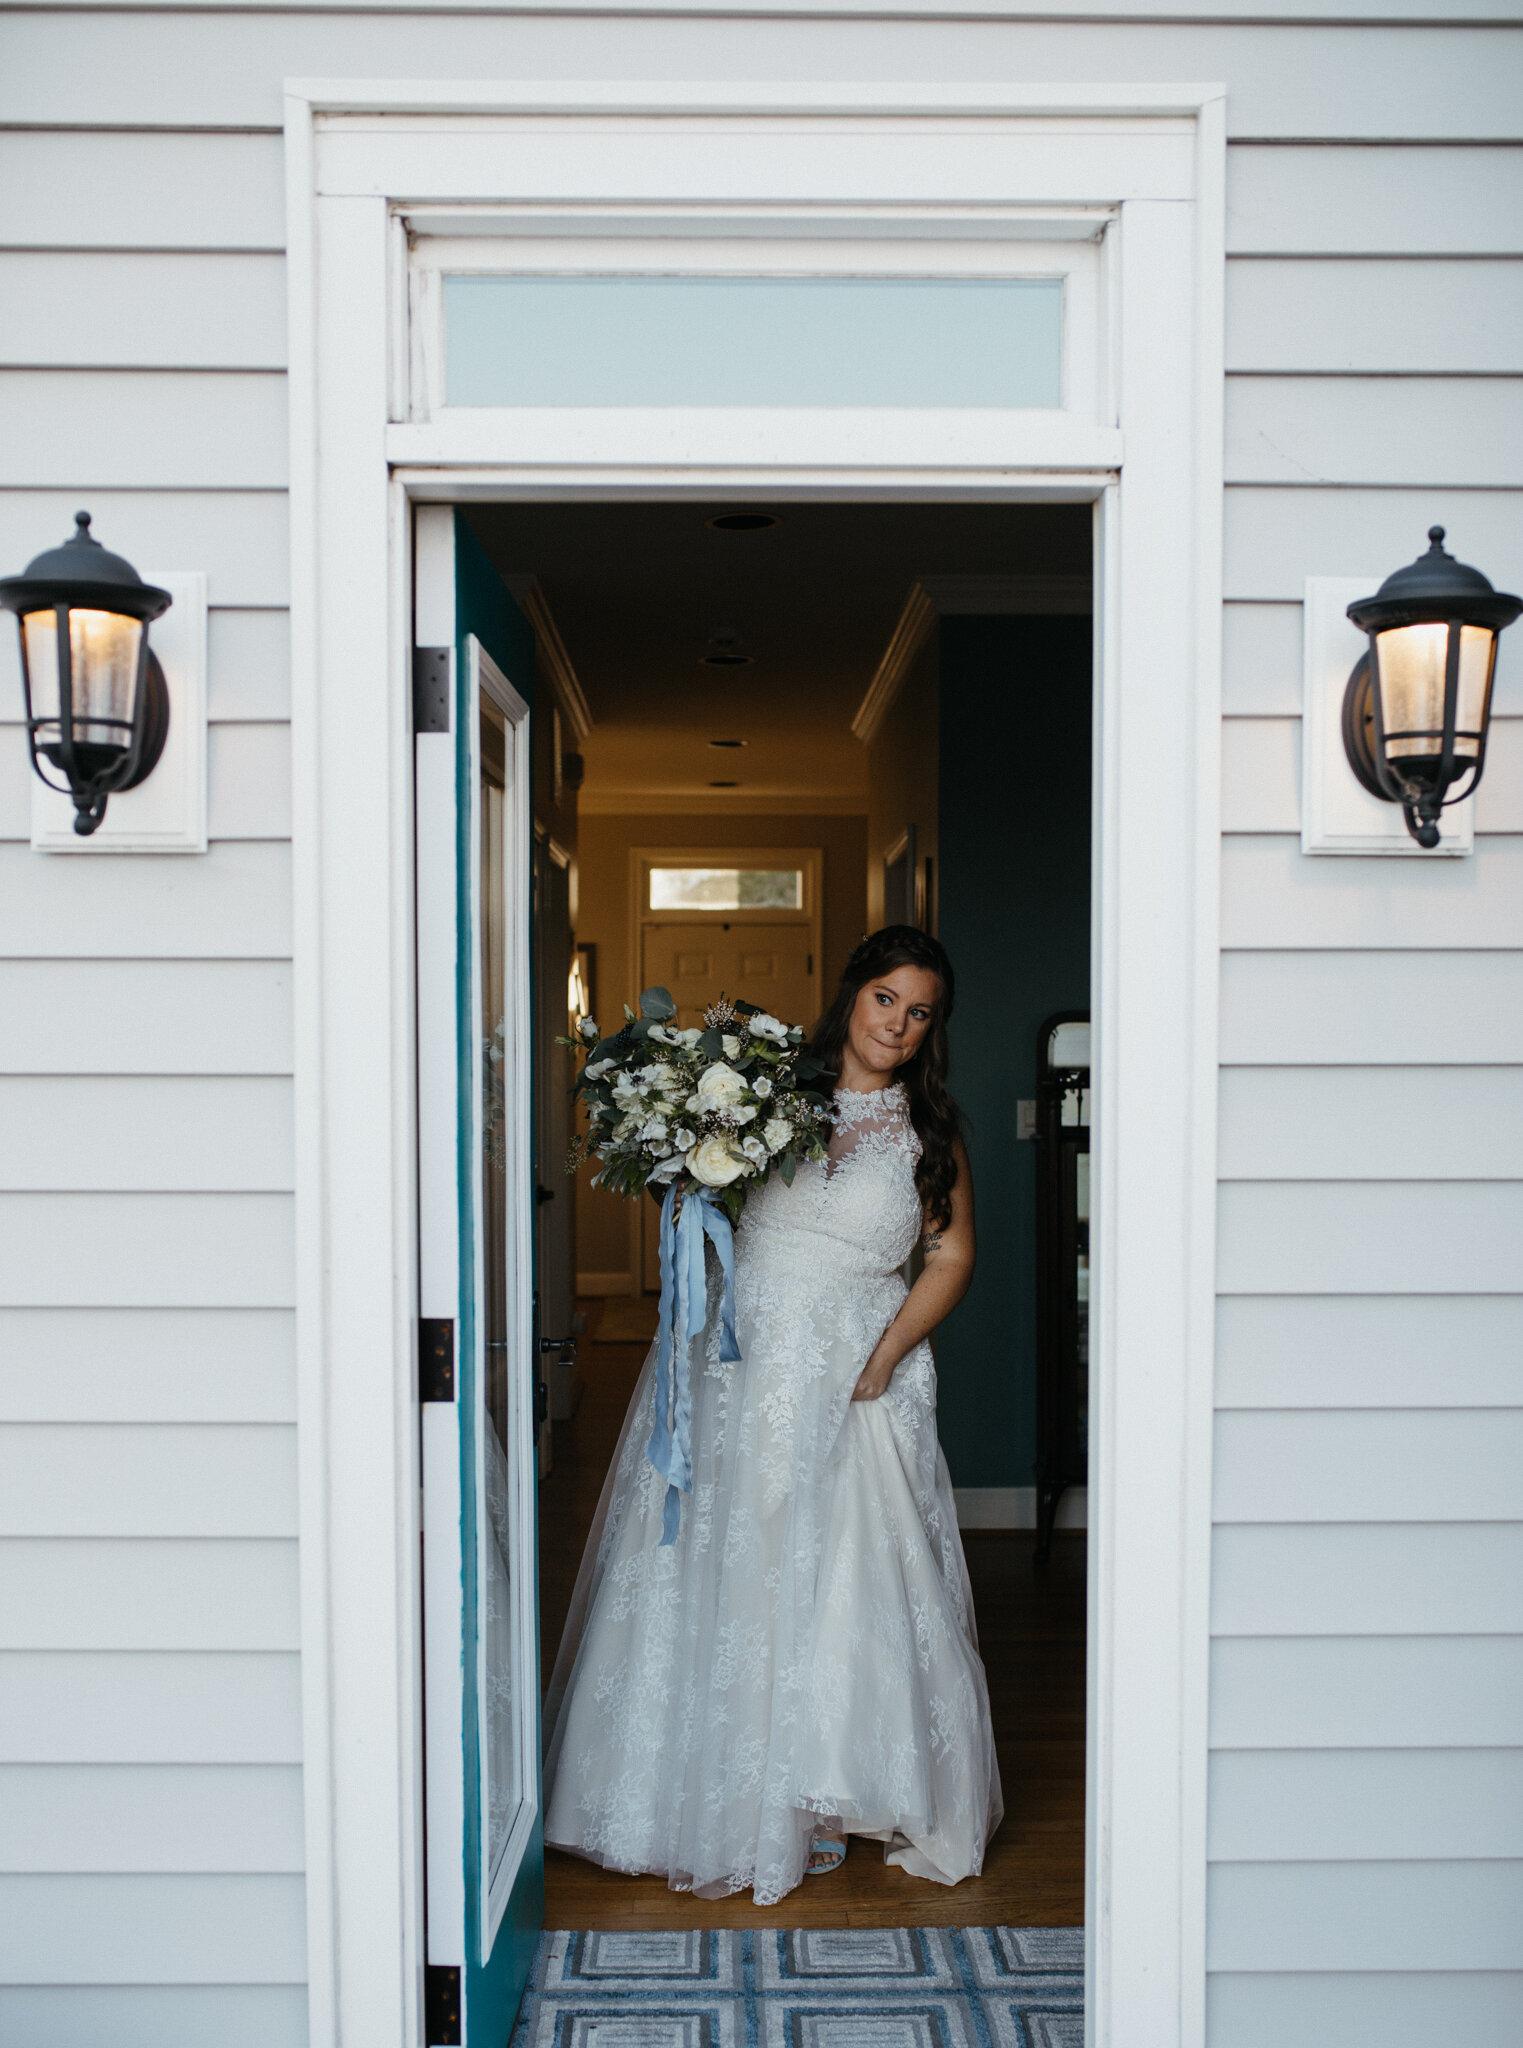 angela_jason_norfolk_wedding-89.jpg